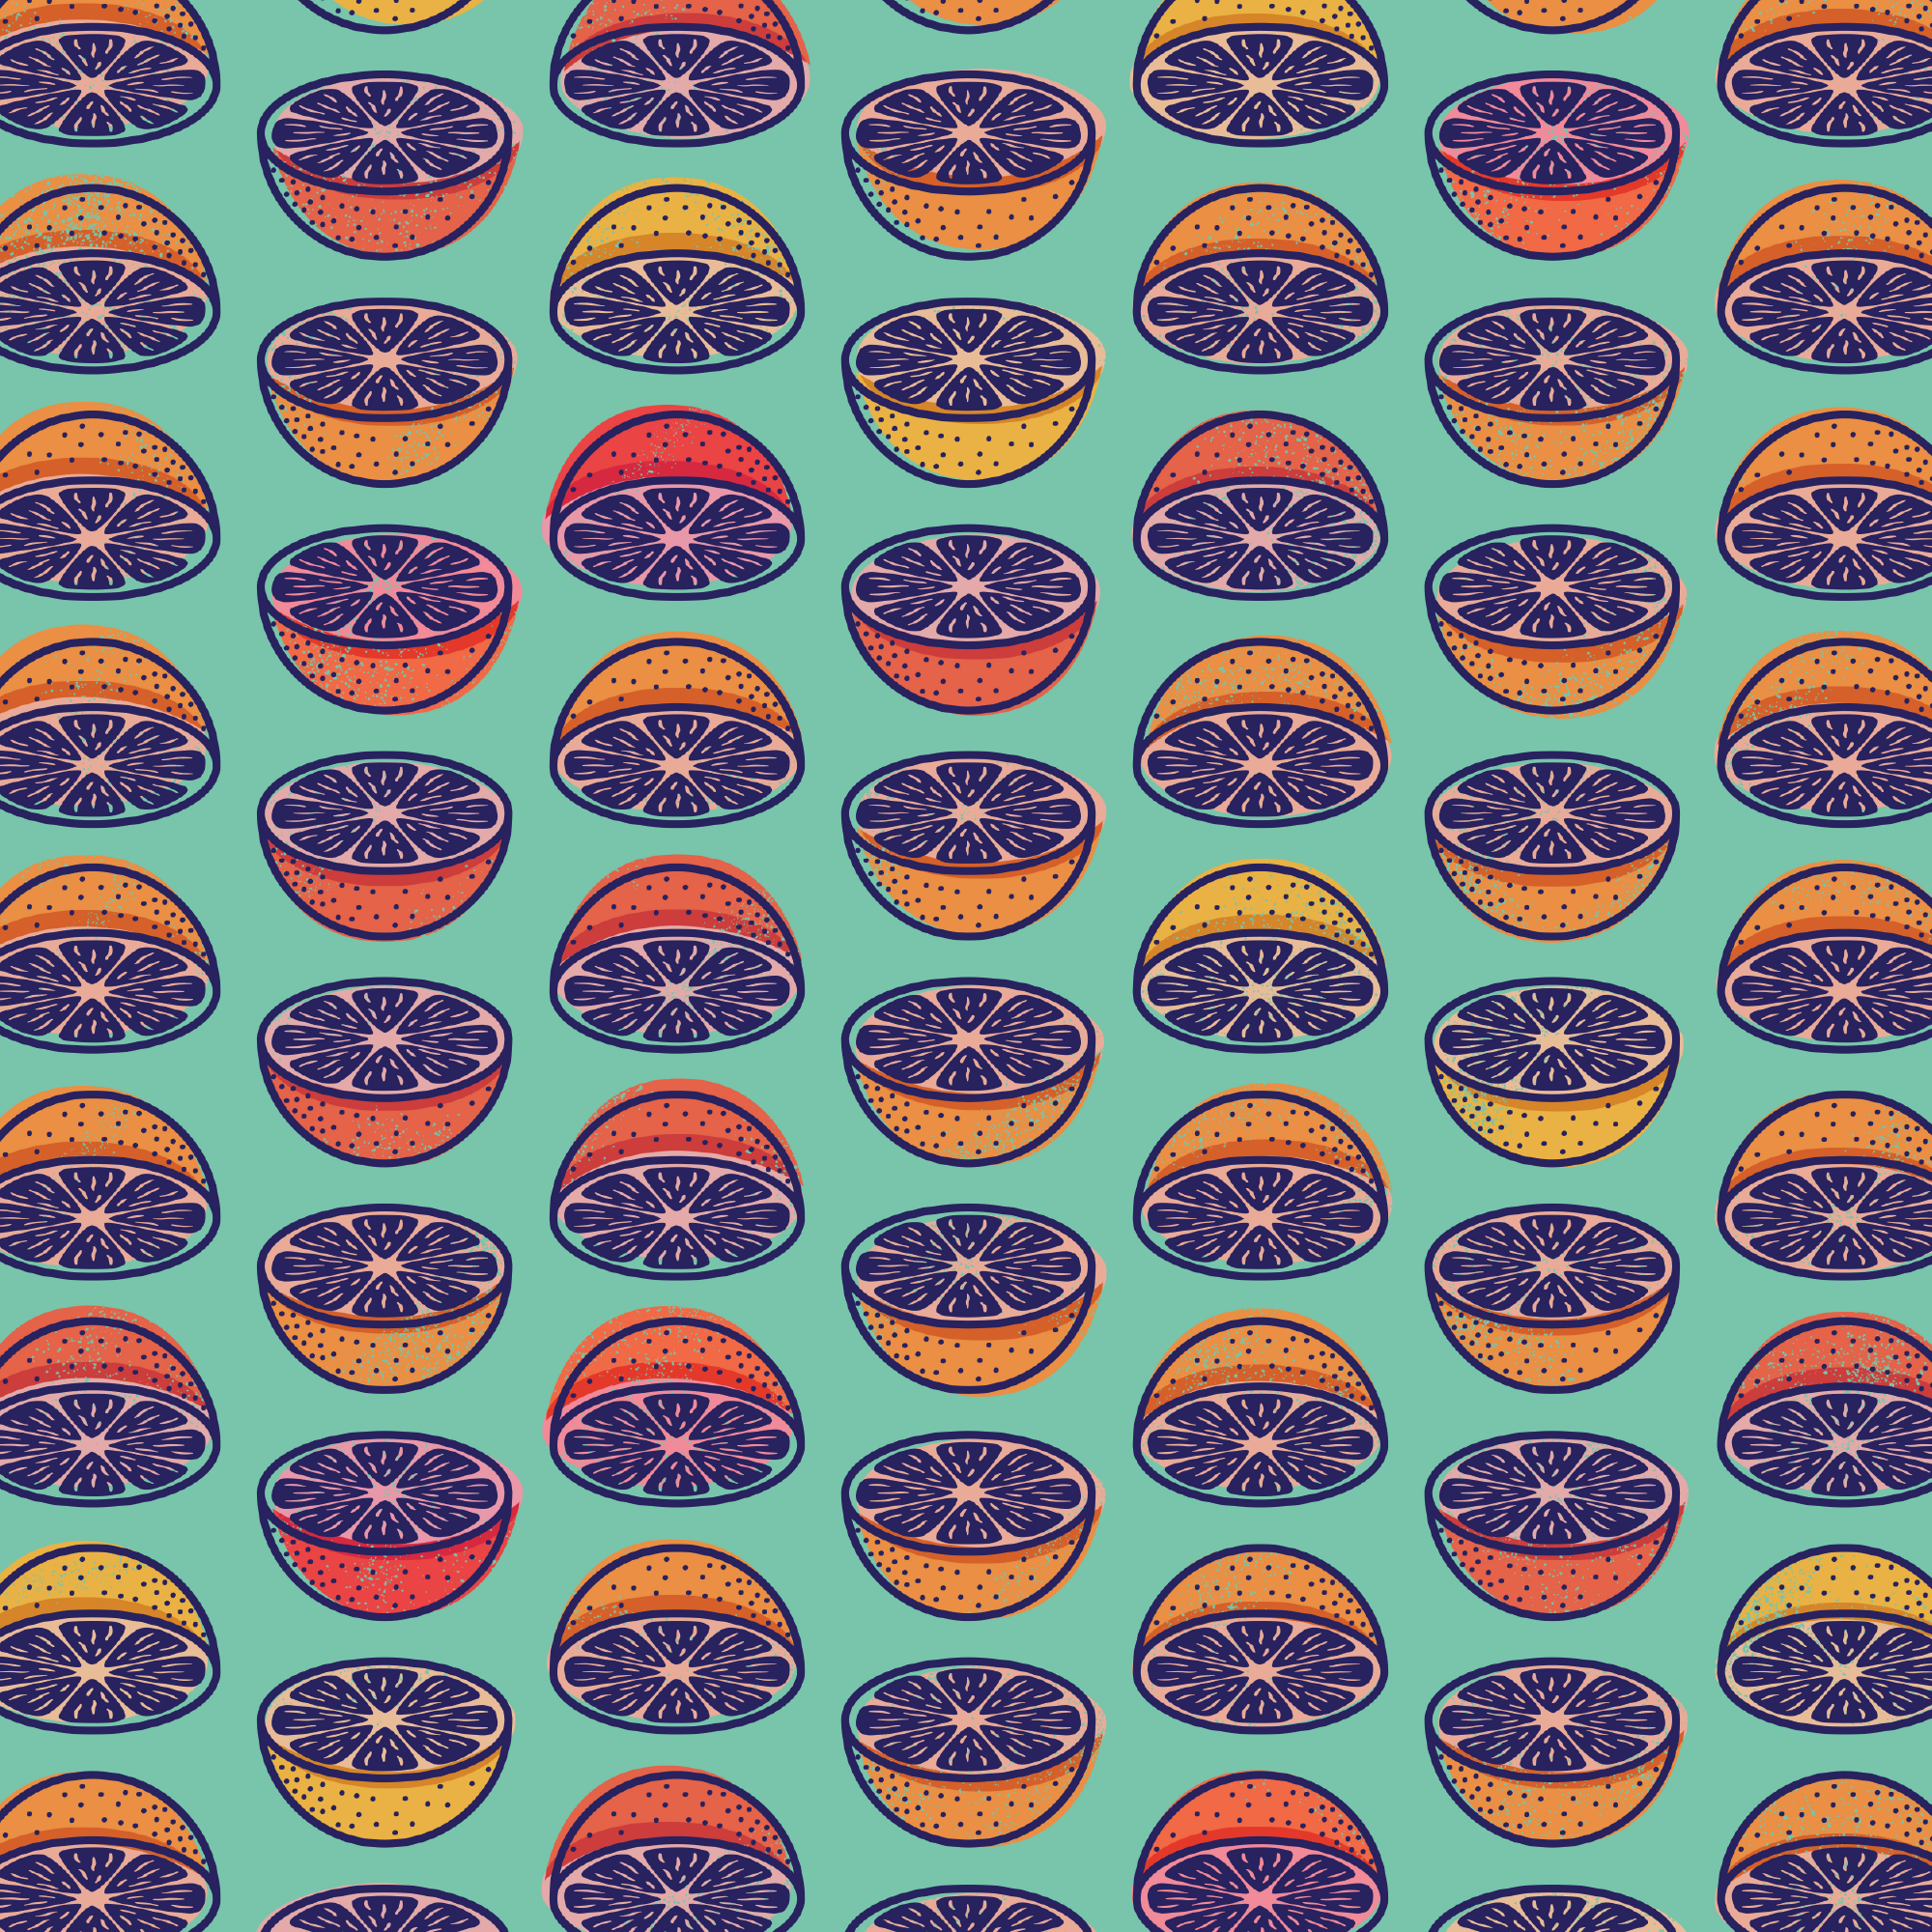 orangesArtboard 1@2x.png